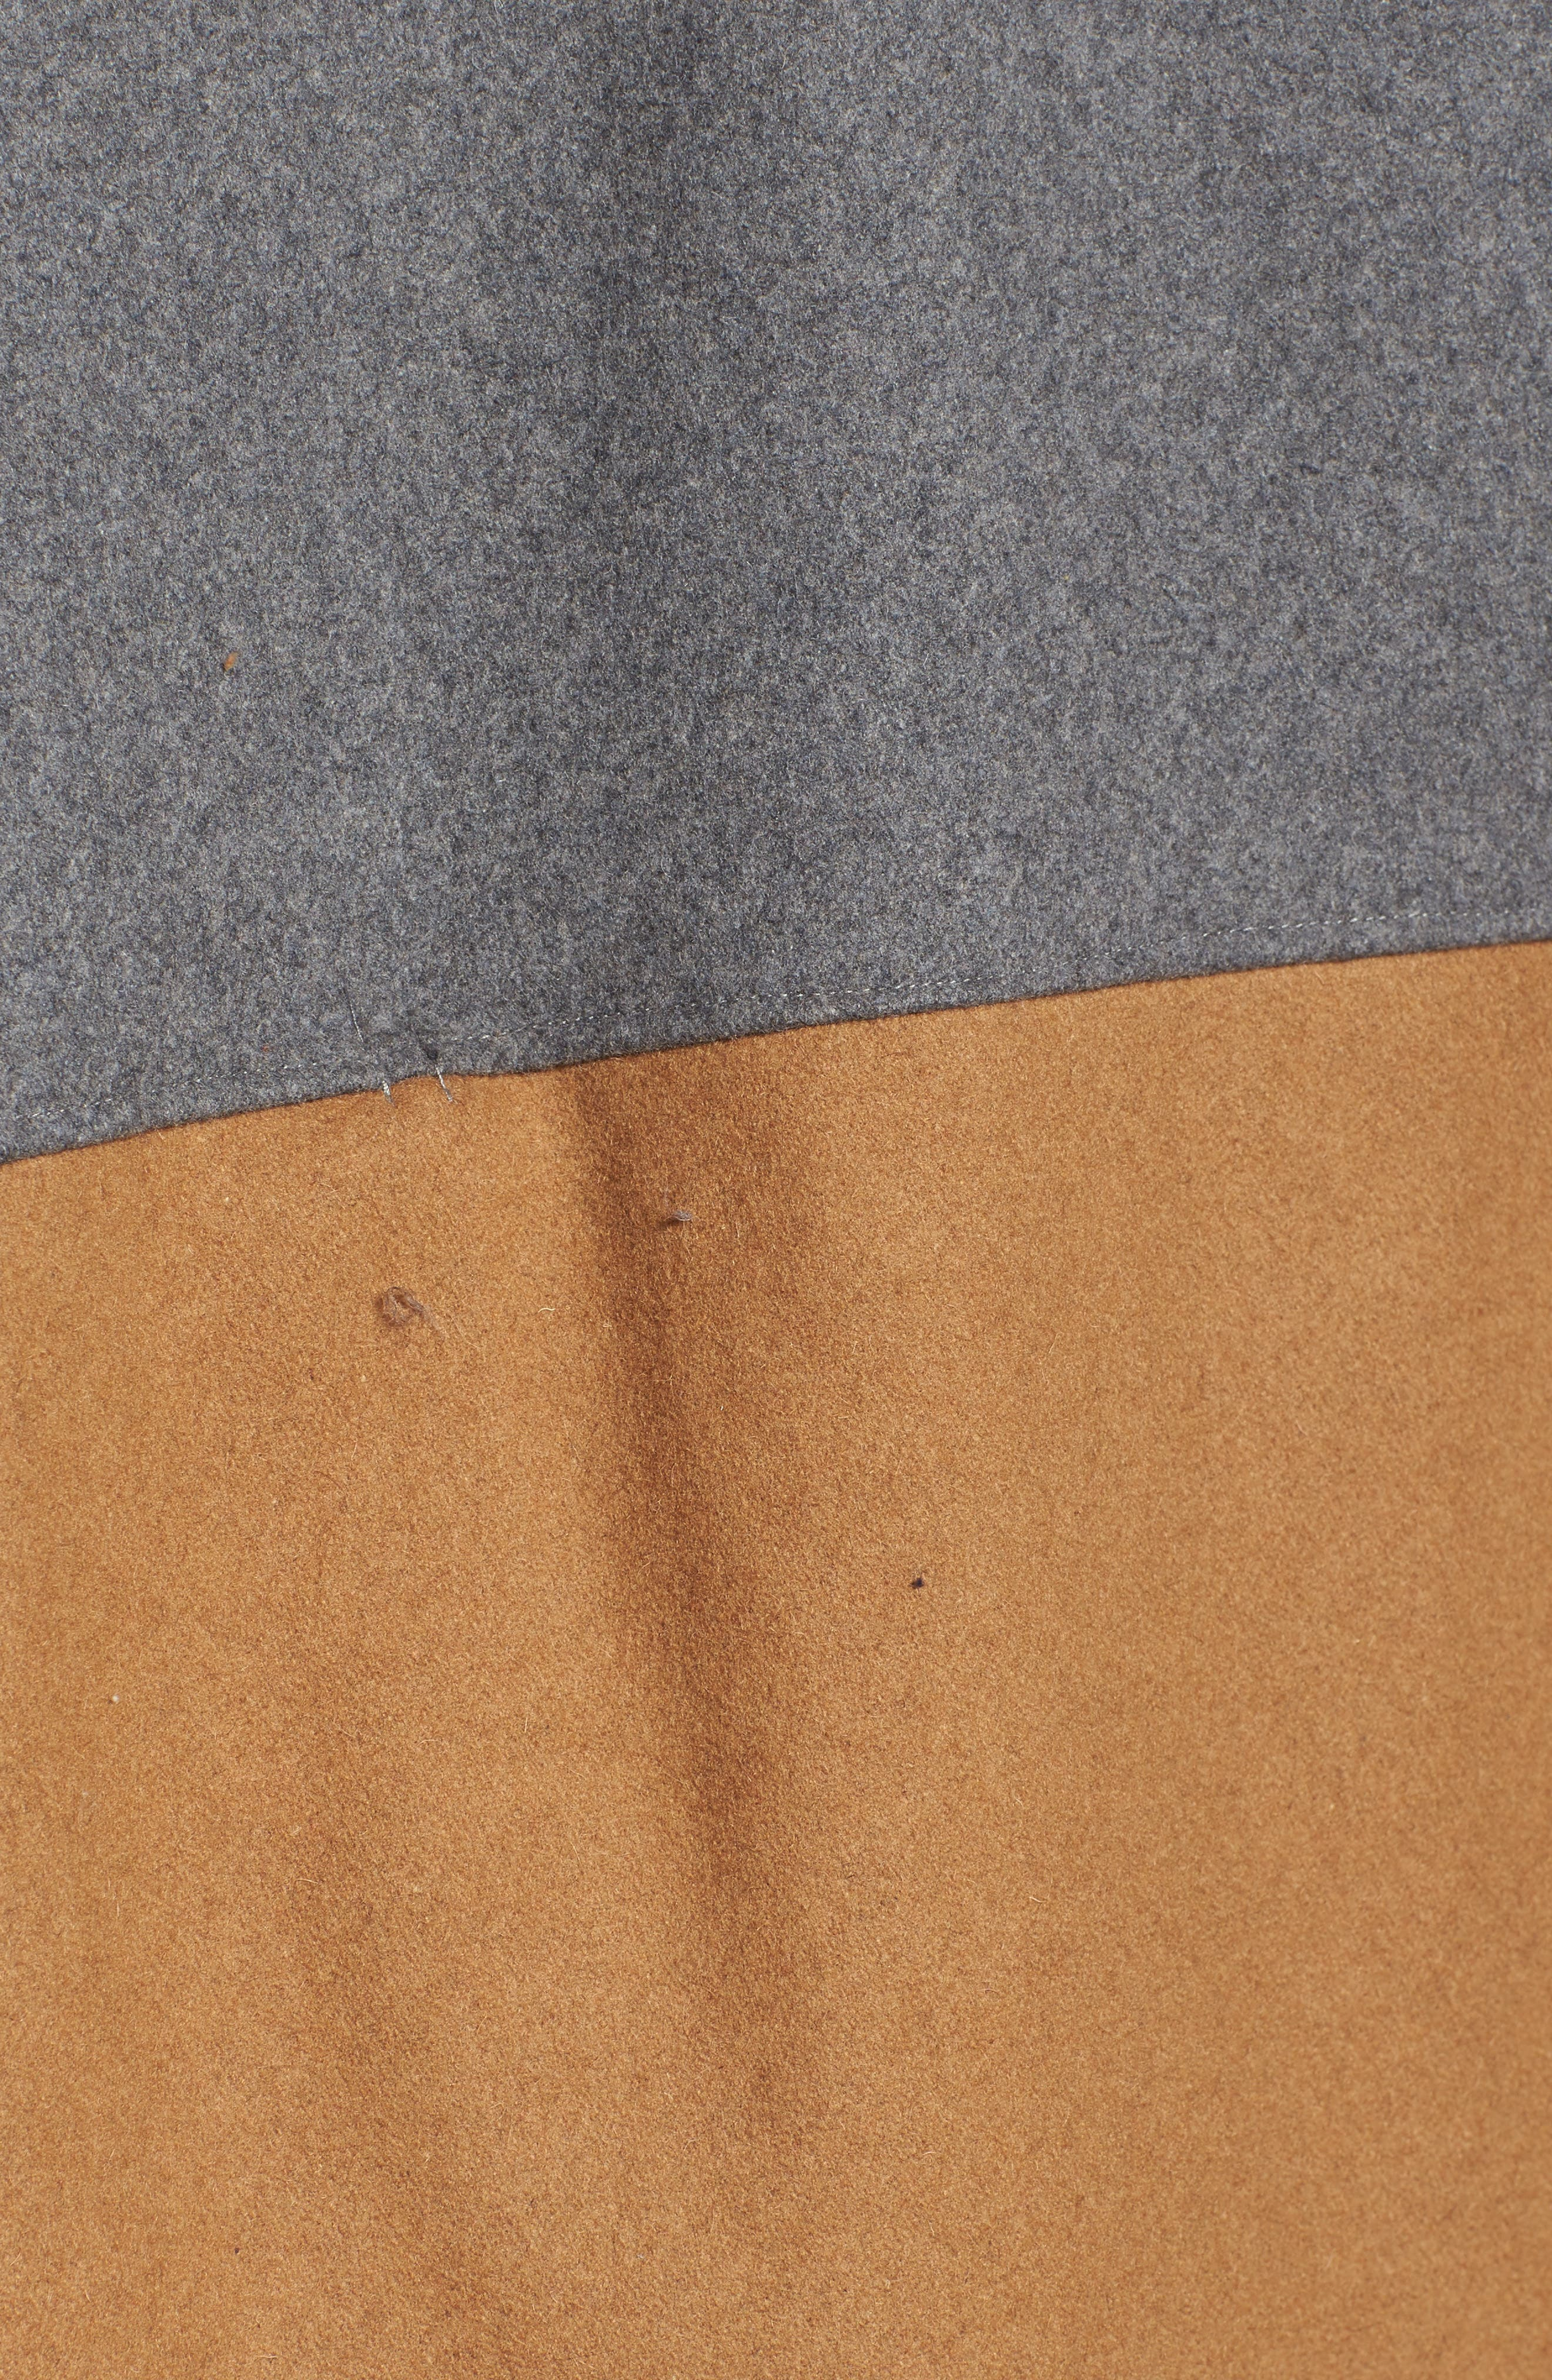 Duo Wonder Wool Cape,                             Alternate thumbnail 5, color,                             020